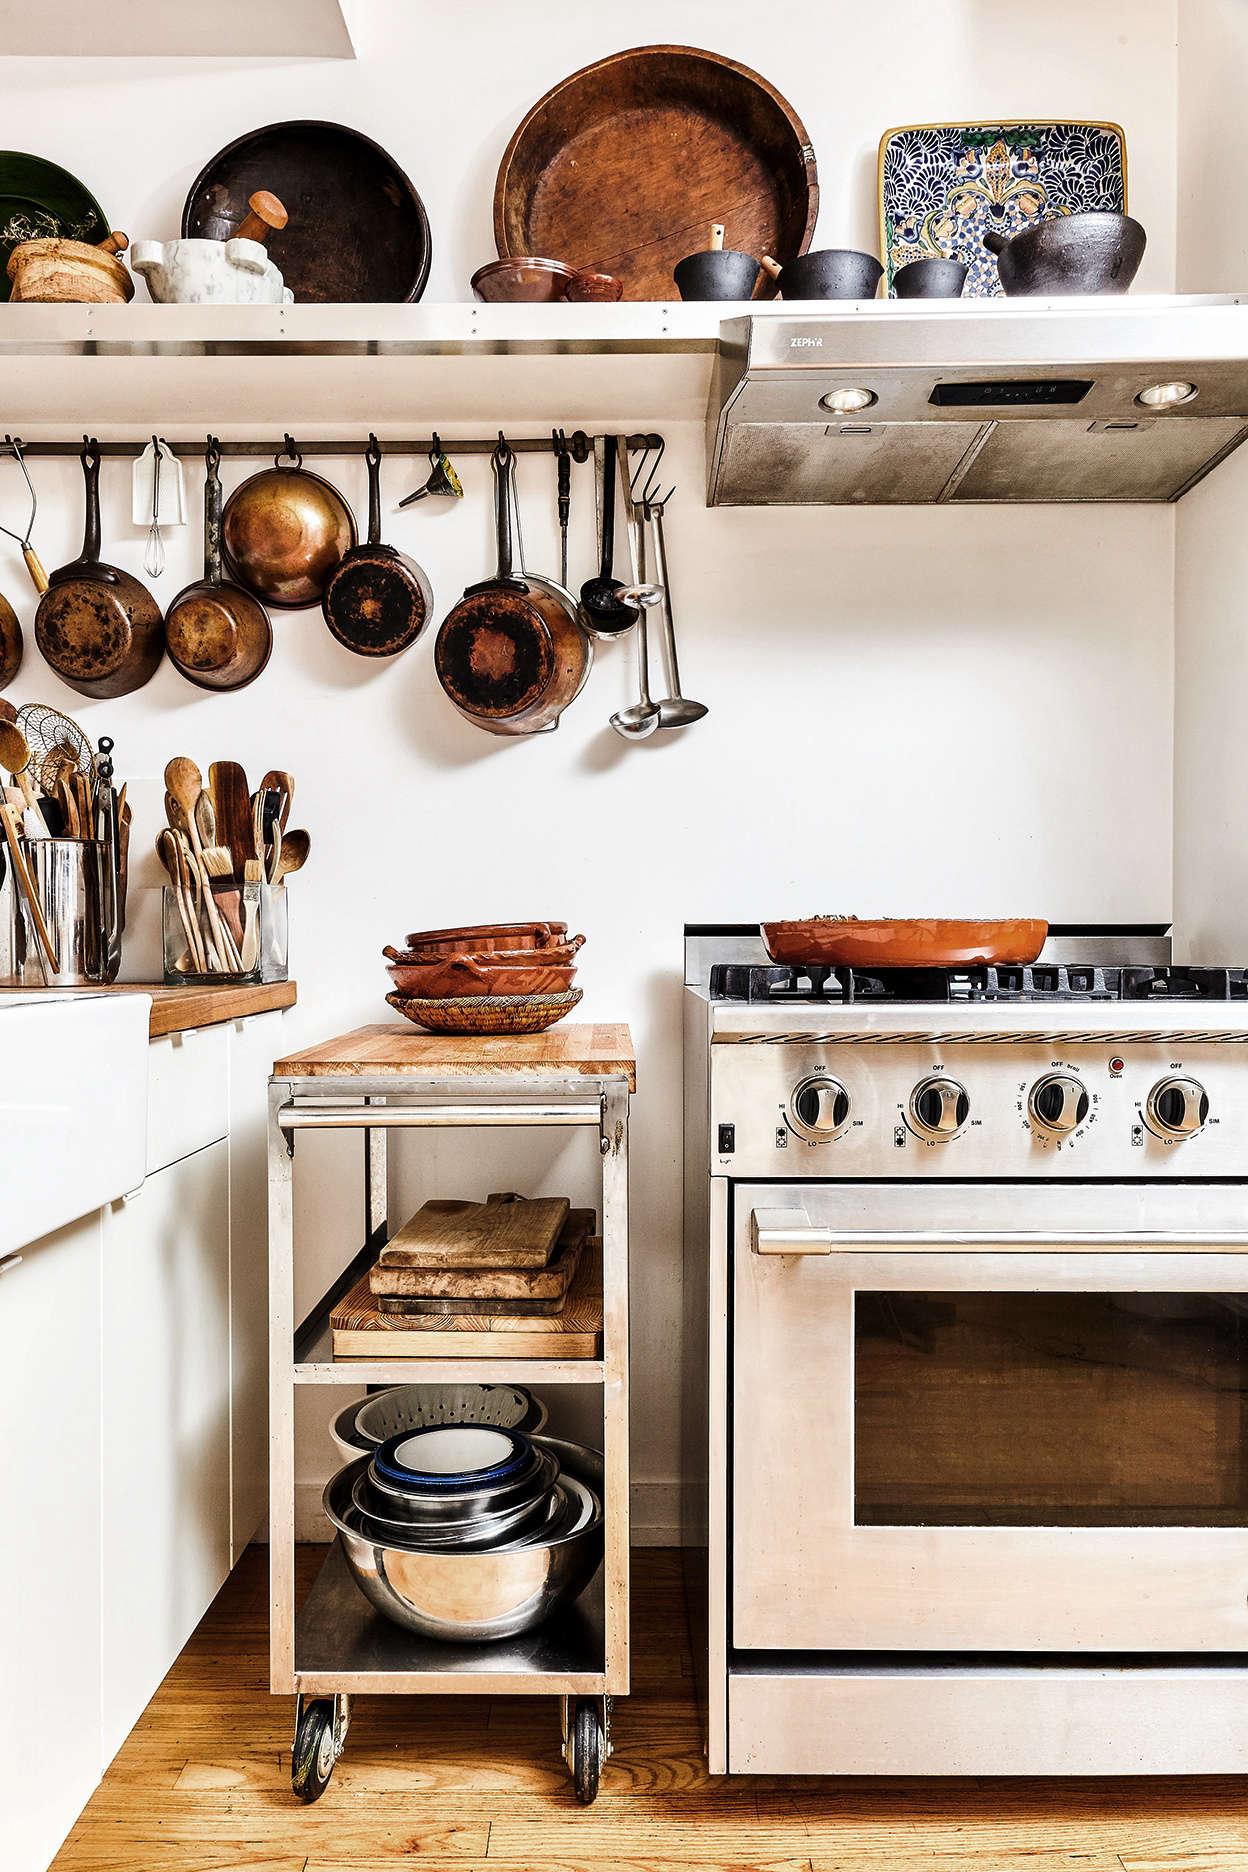 zephyr hood range lighting modern mcallen with combine furniture artcraft updated for look kitchen your under cabinet craigslist hoods also